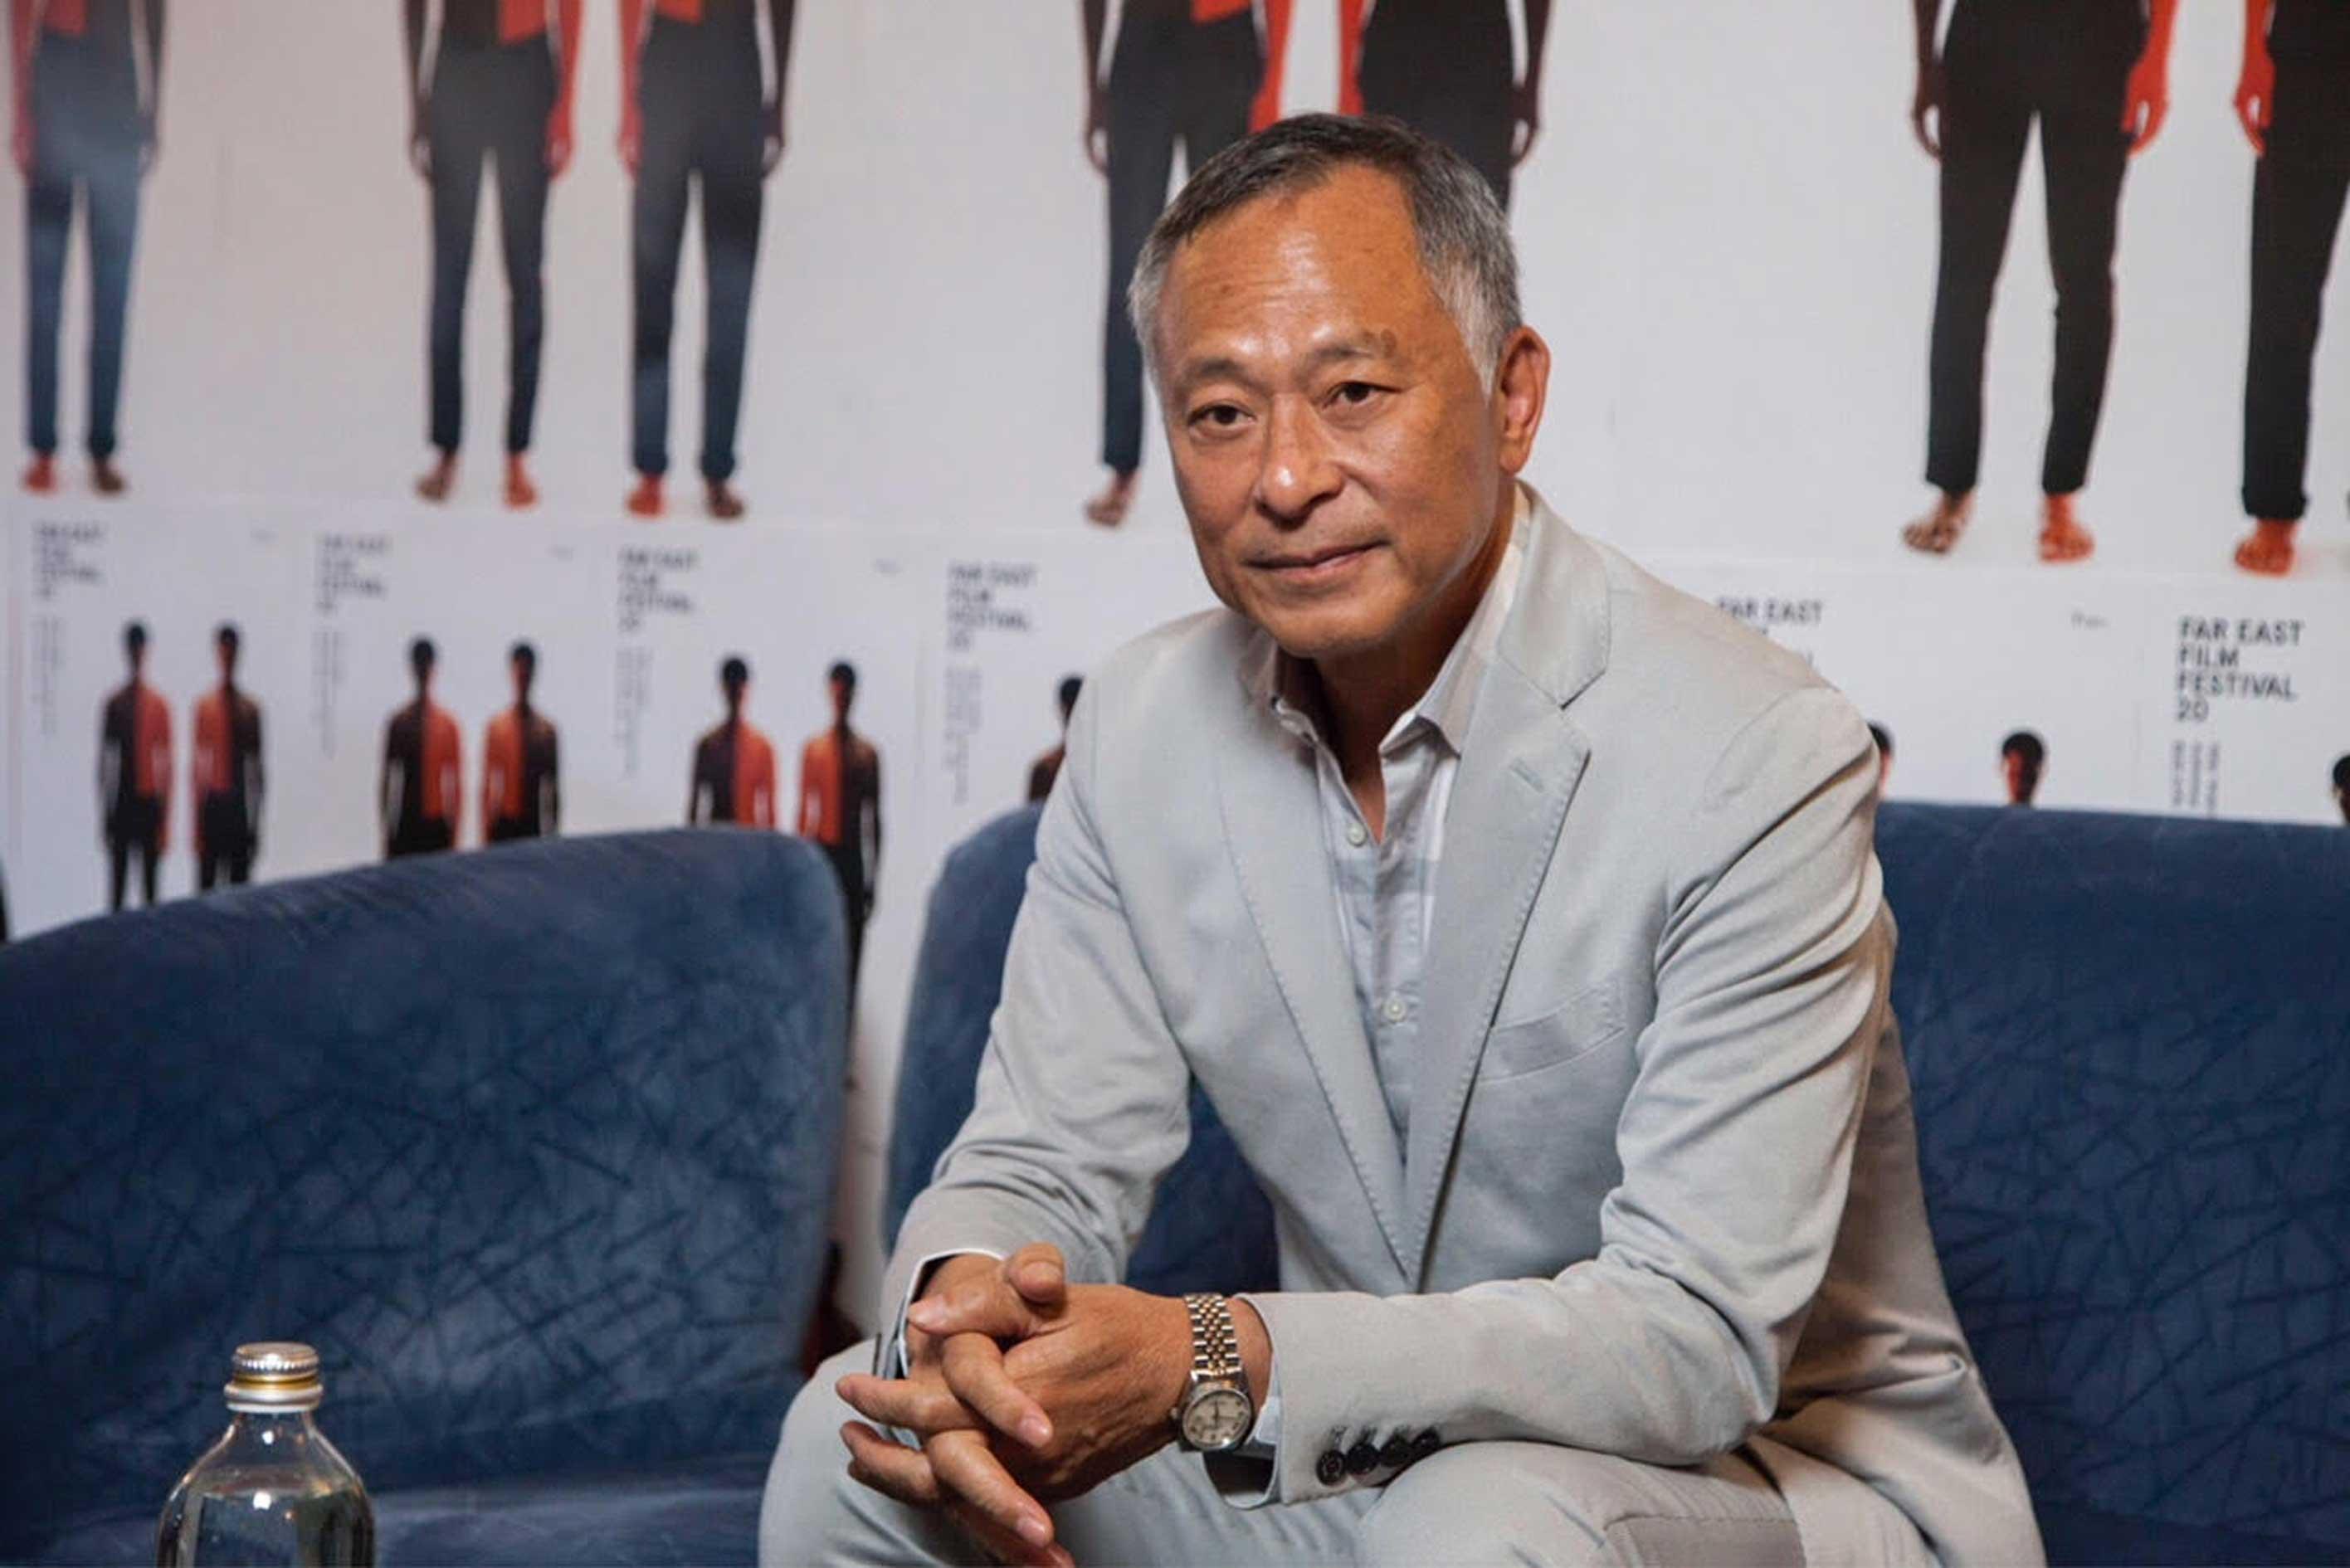 Hong Kong director Johnnie To Kei-fung